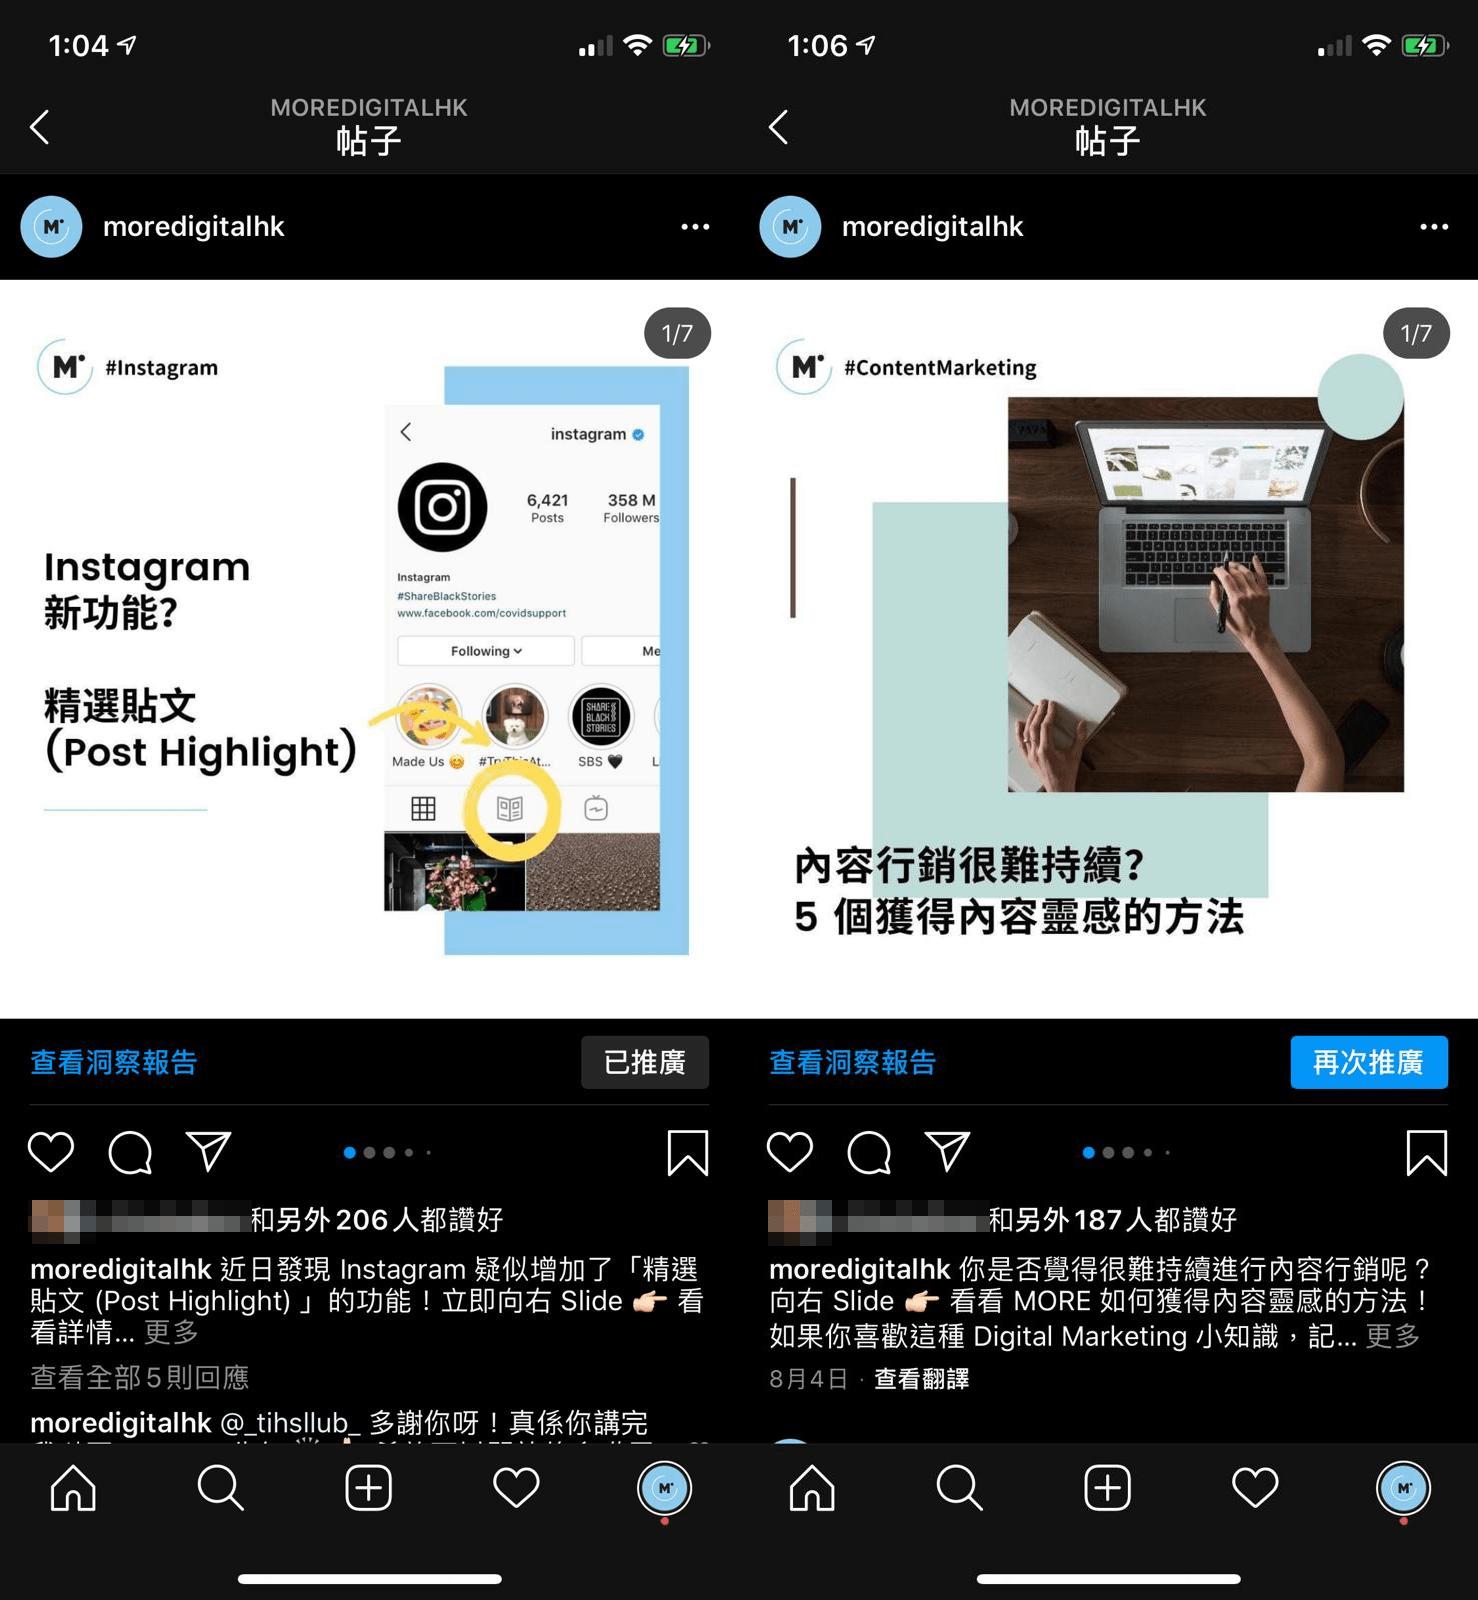 Direct boost via IG